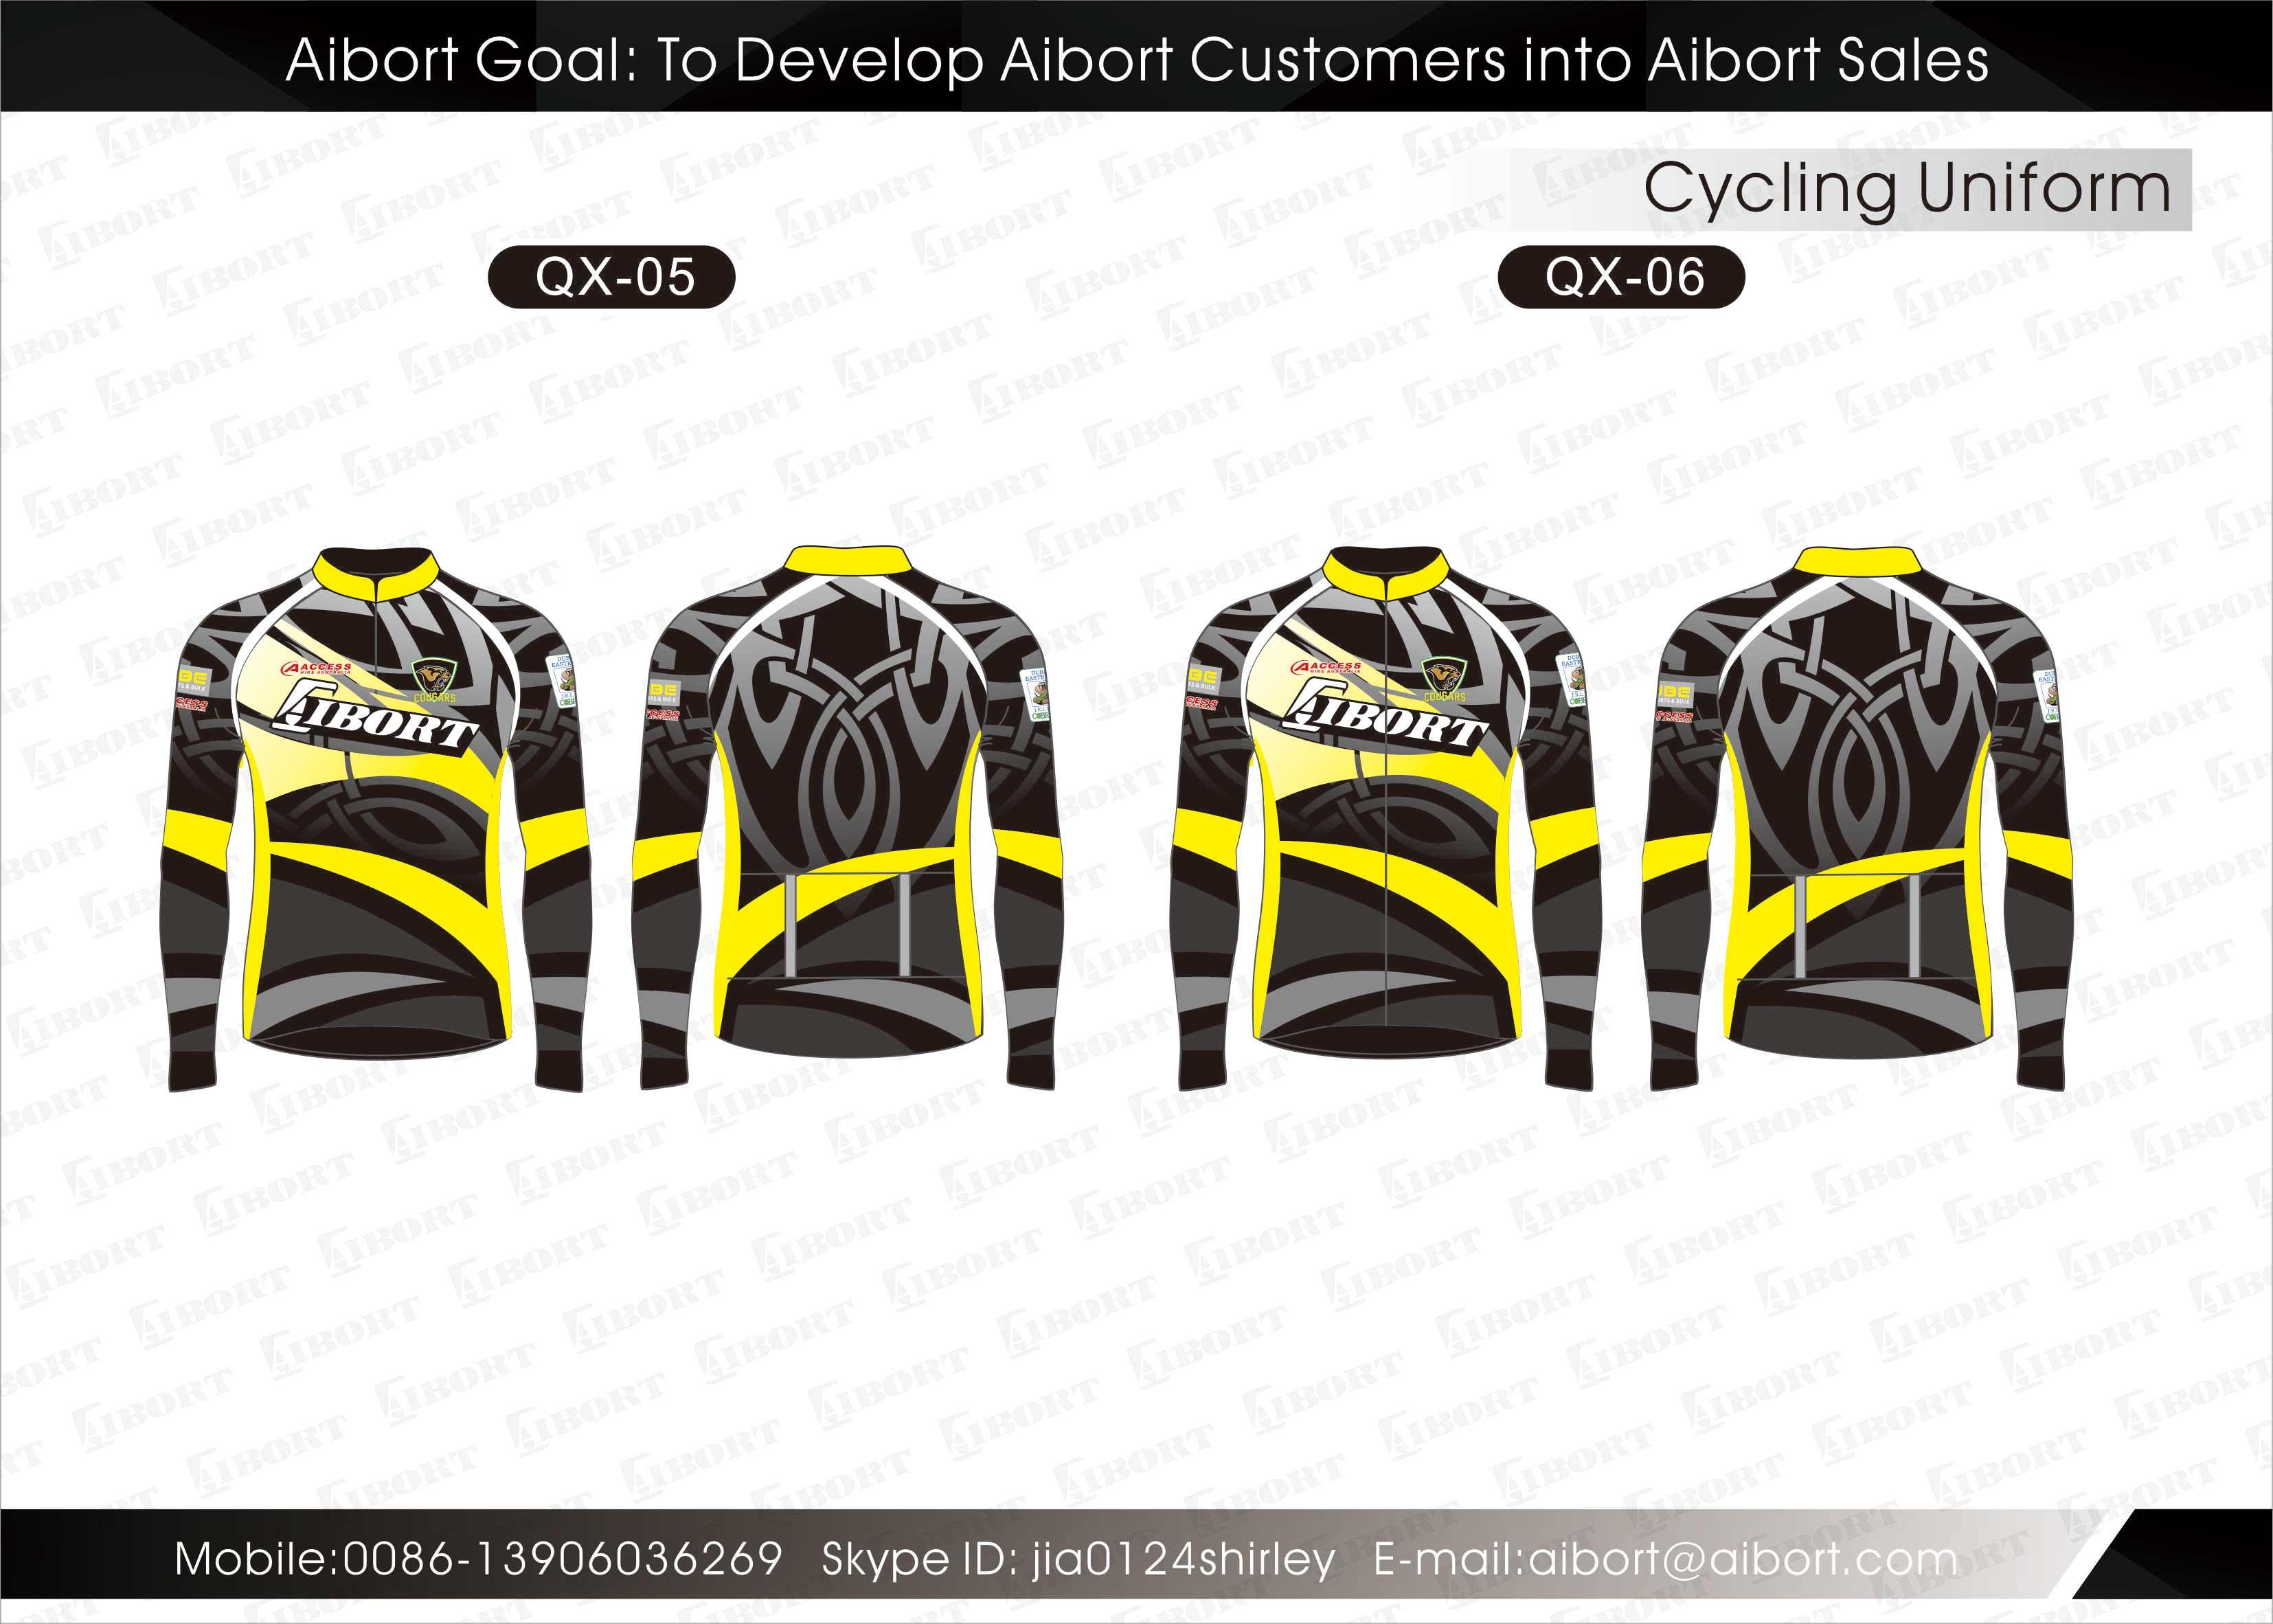 Op Maat Gemaakte : Aangepaste volledig op maat gemaakte fietskleding op maat aibort